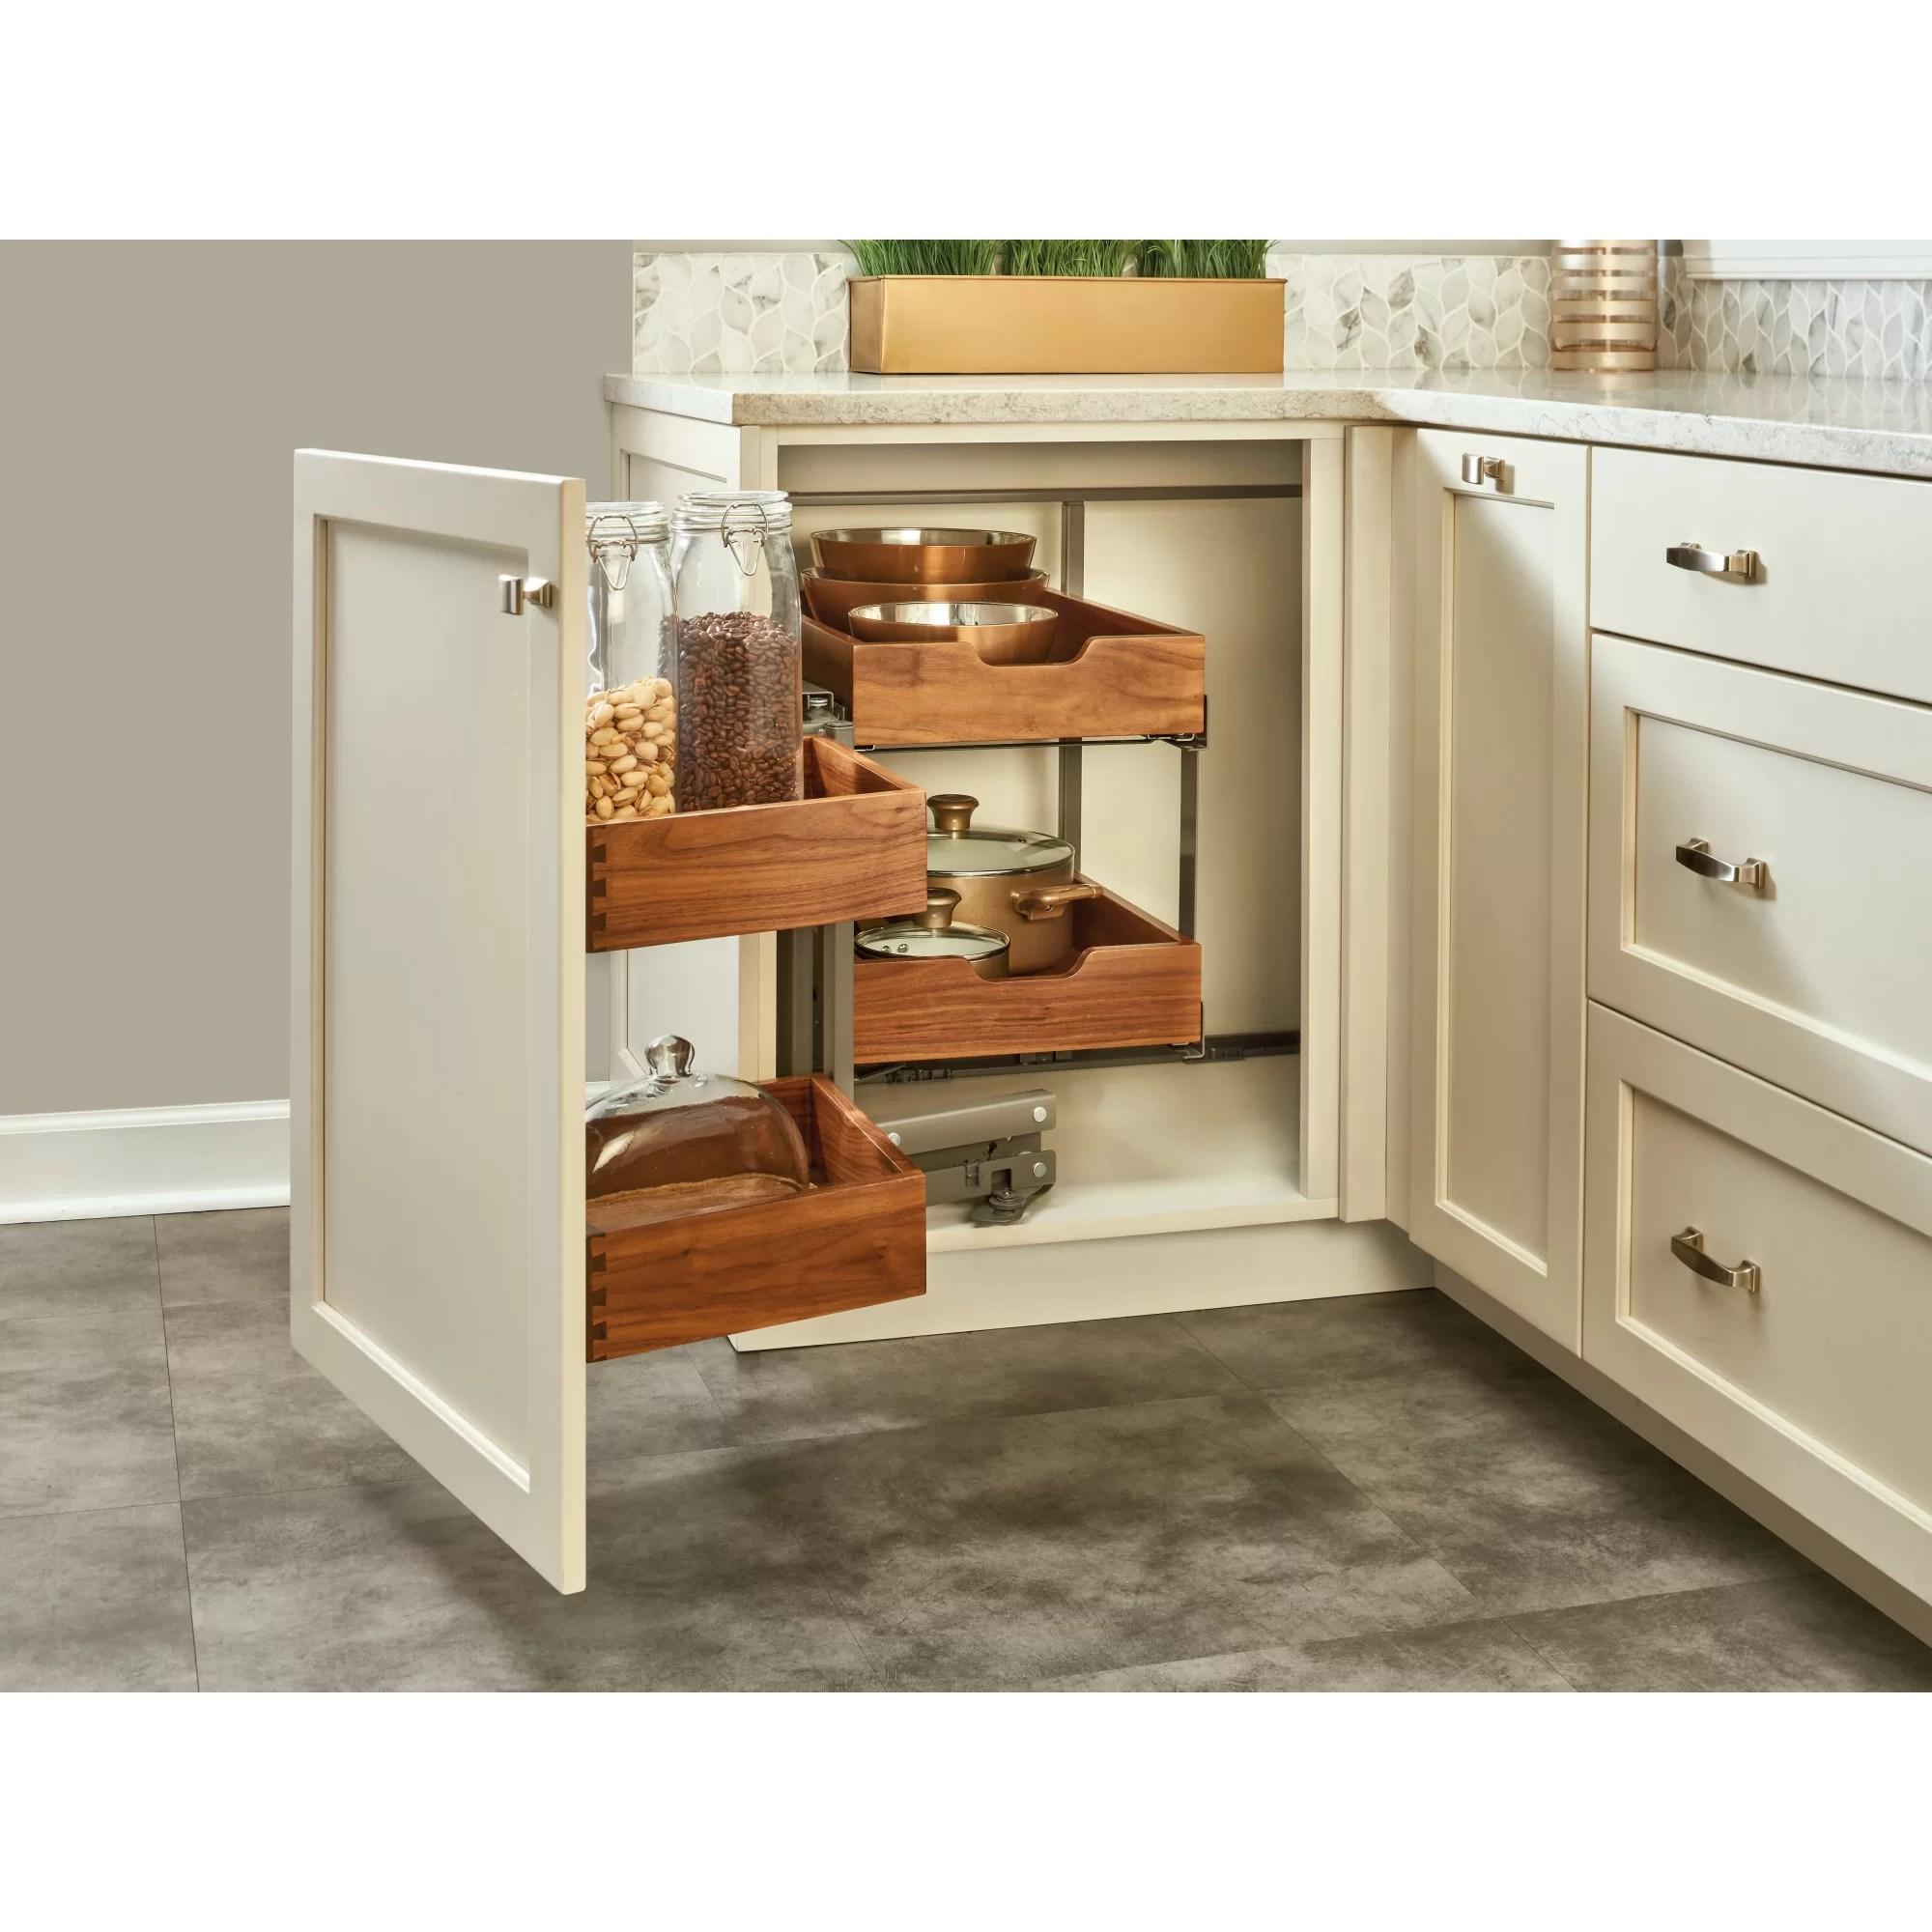 Rev A Shelf Blind Corner Cabinet Organizer Pull Out Pantry